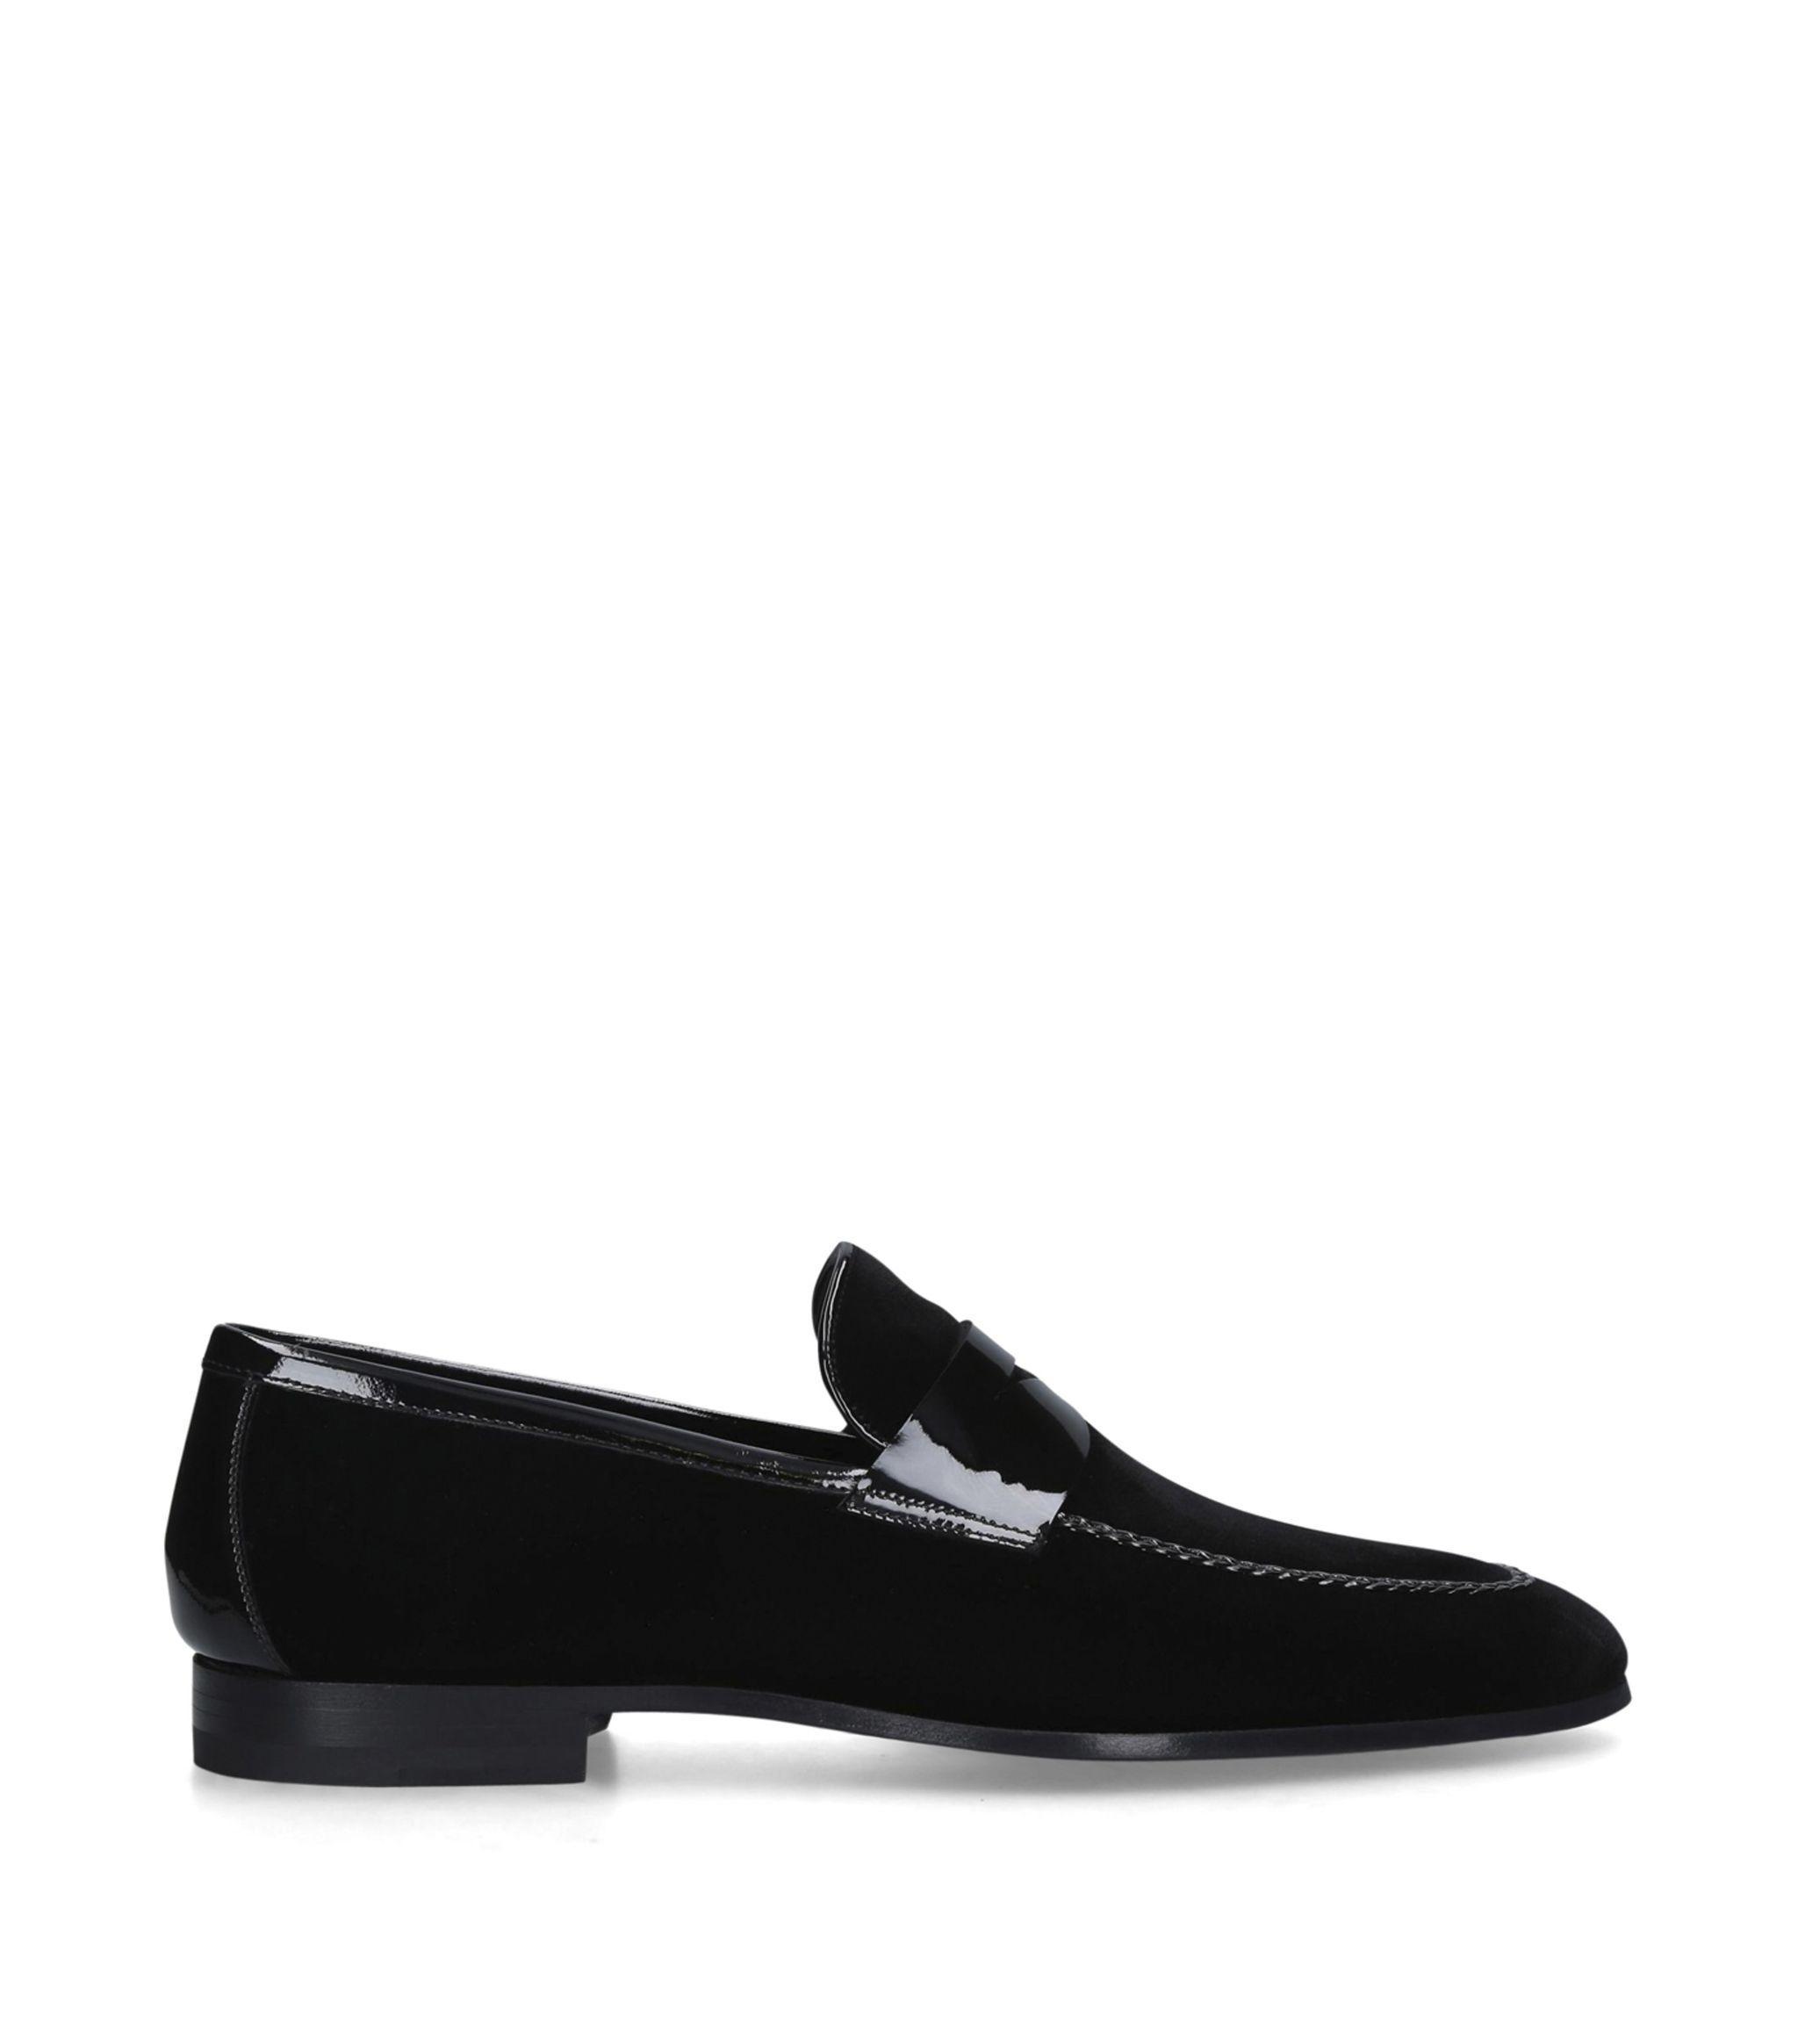 Magnanni Penny Velvet Loafers in Black for Men - Lyst